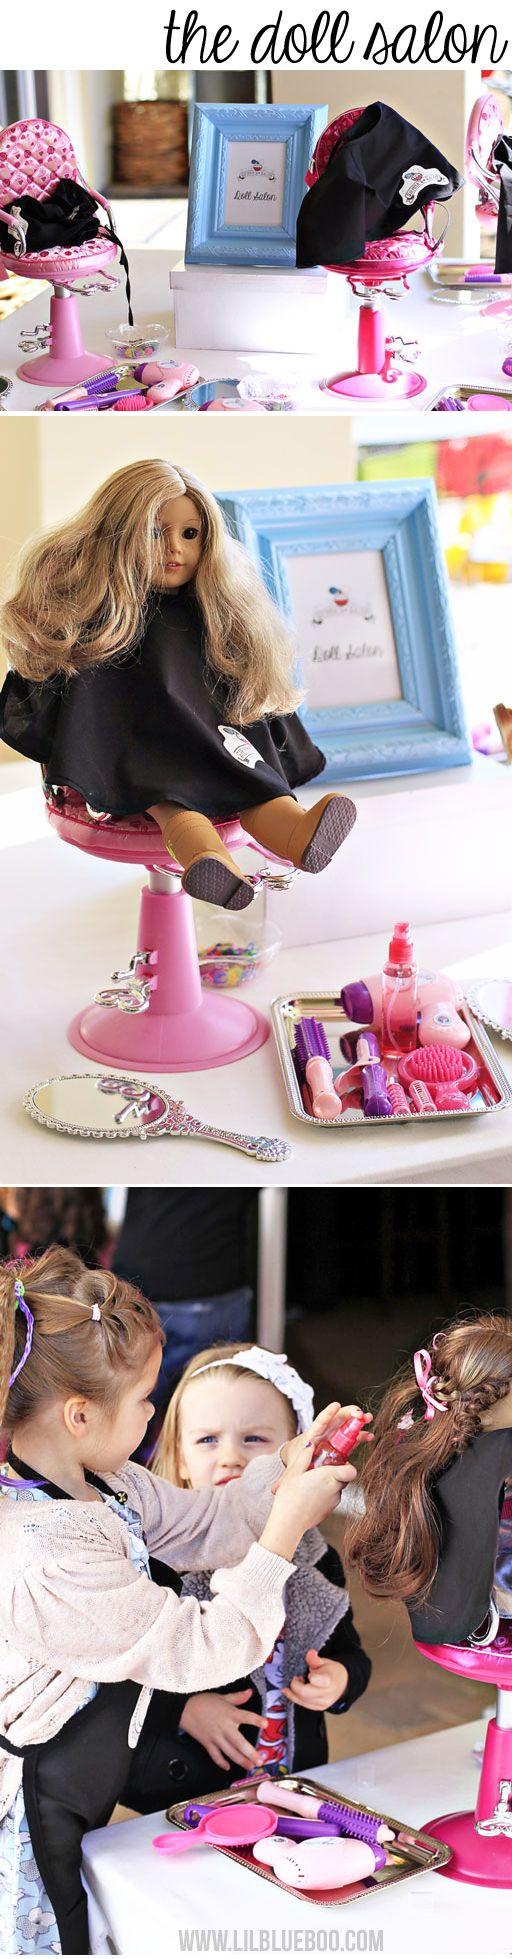 american girl sized salon party station via lilblueboo com